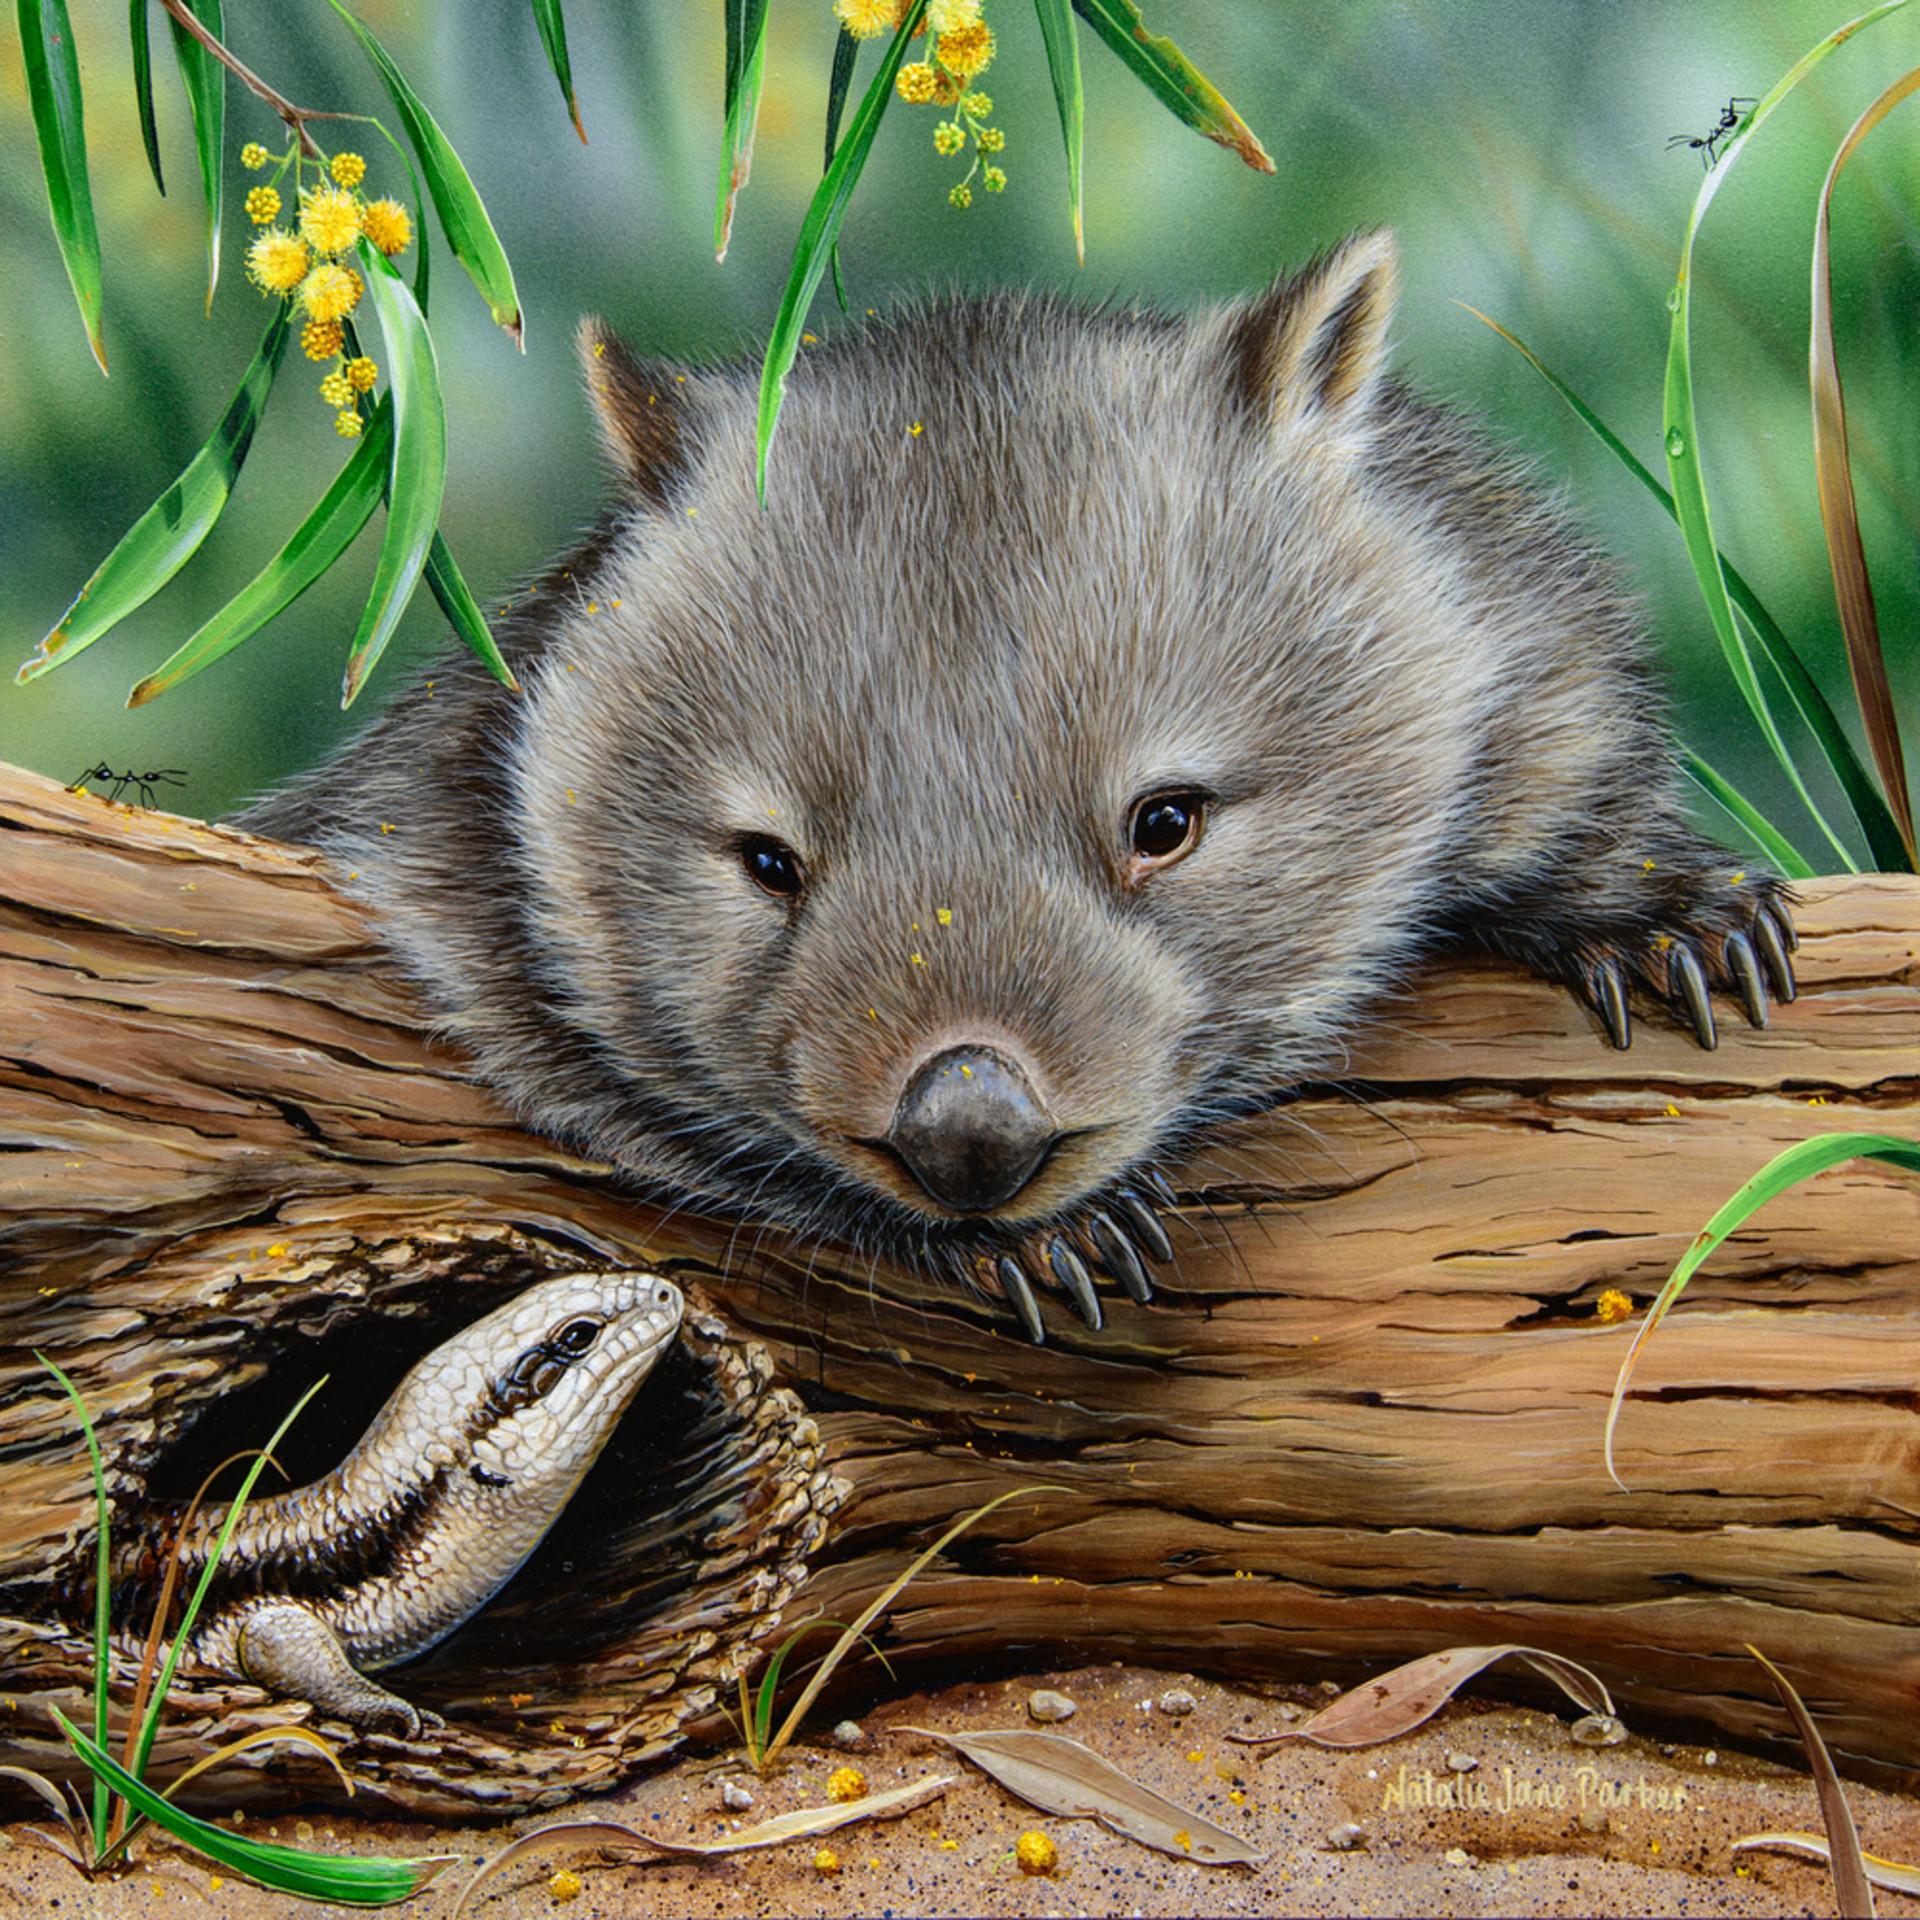 G day   hairy nosed wombat with eastern blue tongue lizard natalie jane parker australian native wildlife vcfk0v